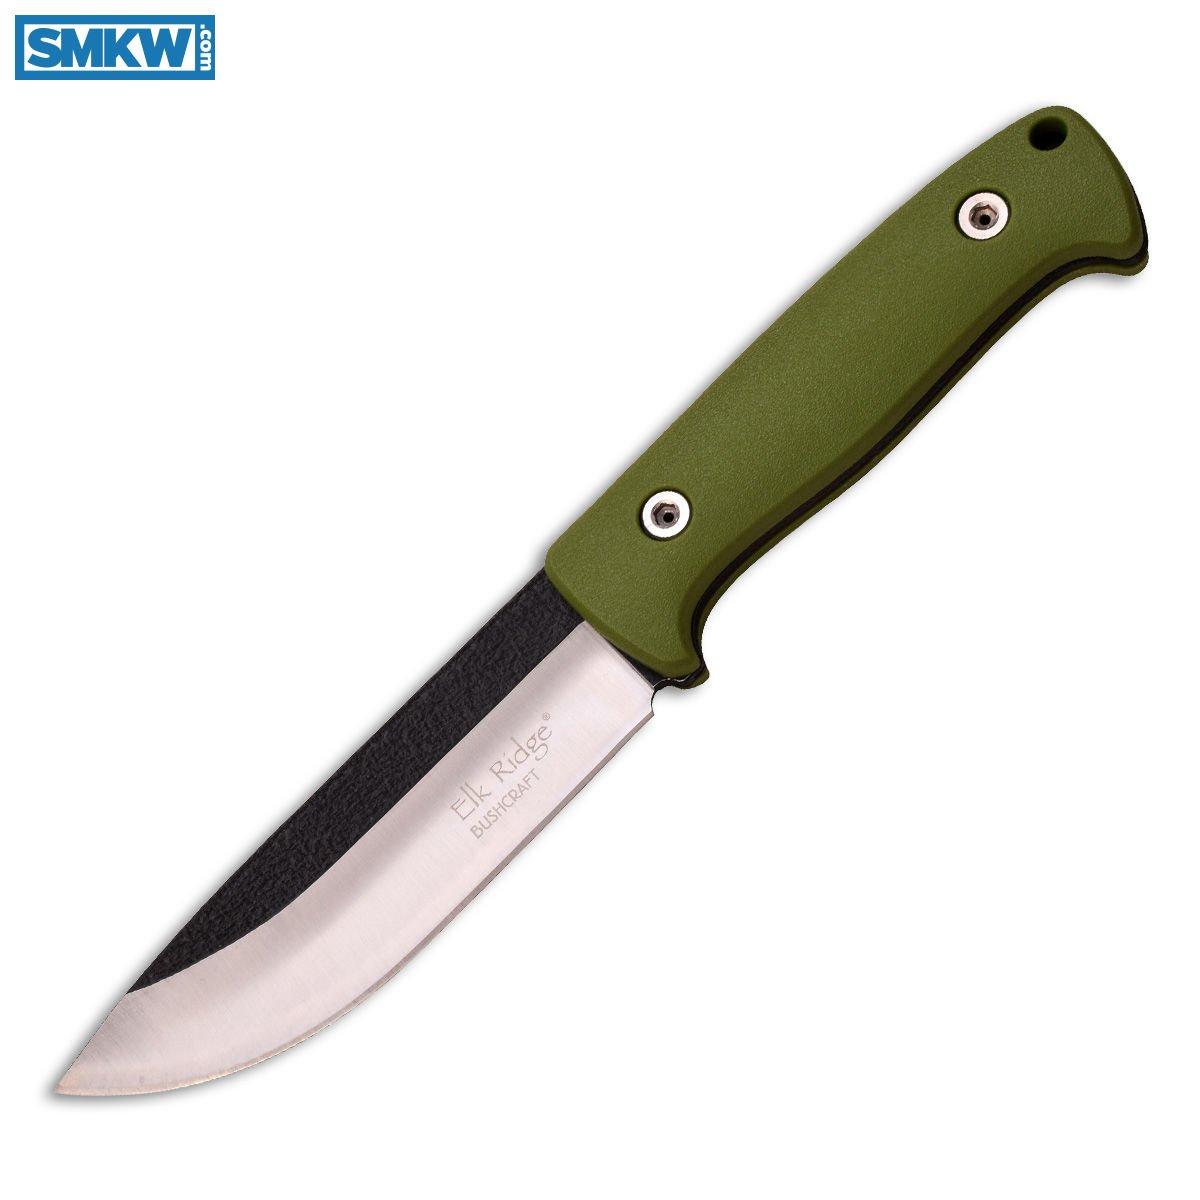 Master Cutlery Elk Ridge Fixed Blade Knife Green Nylon Fiber Handle w/  Sheath & Firestarter - $11 99 (Free S/H over $99, excludes ammo)